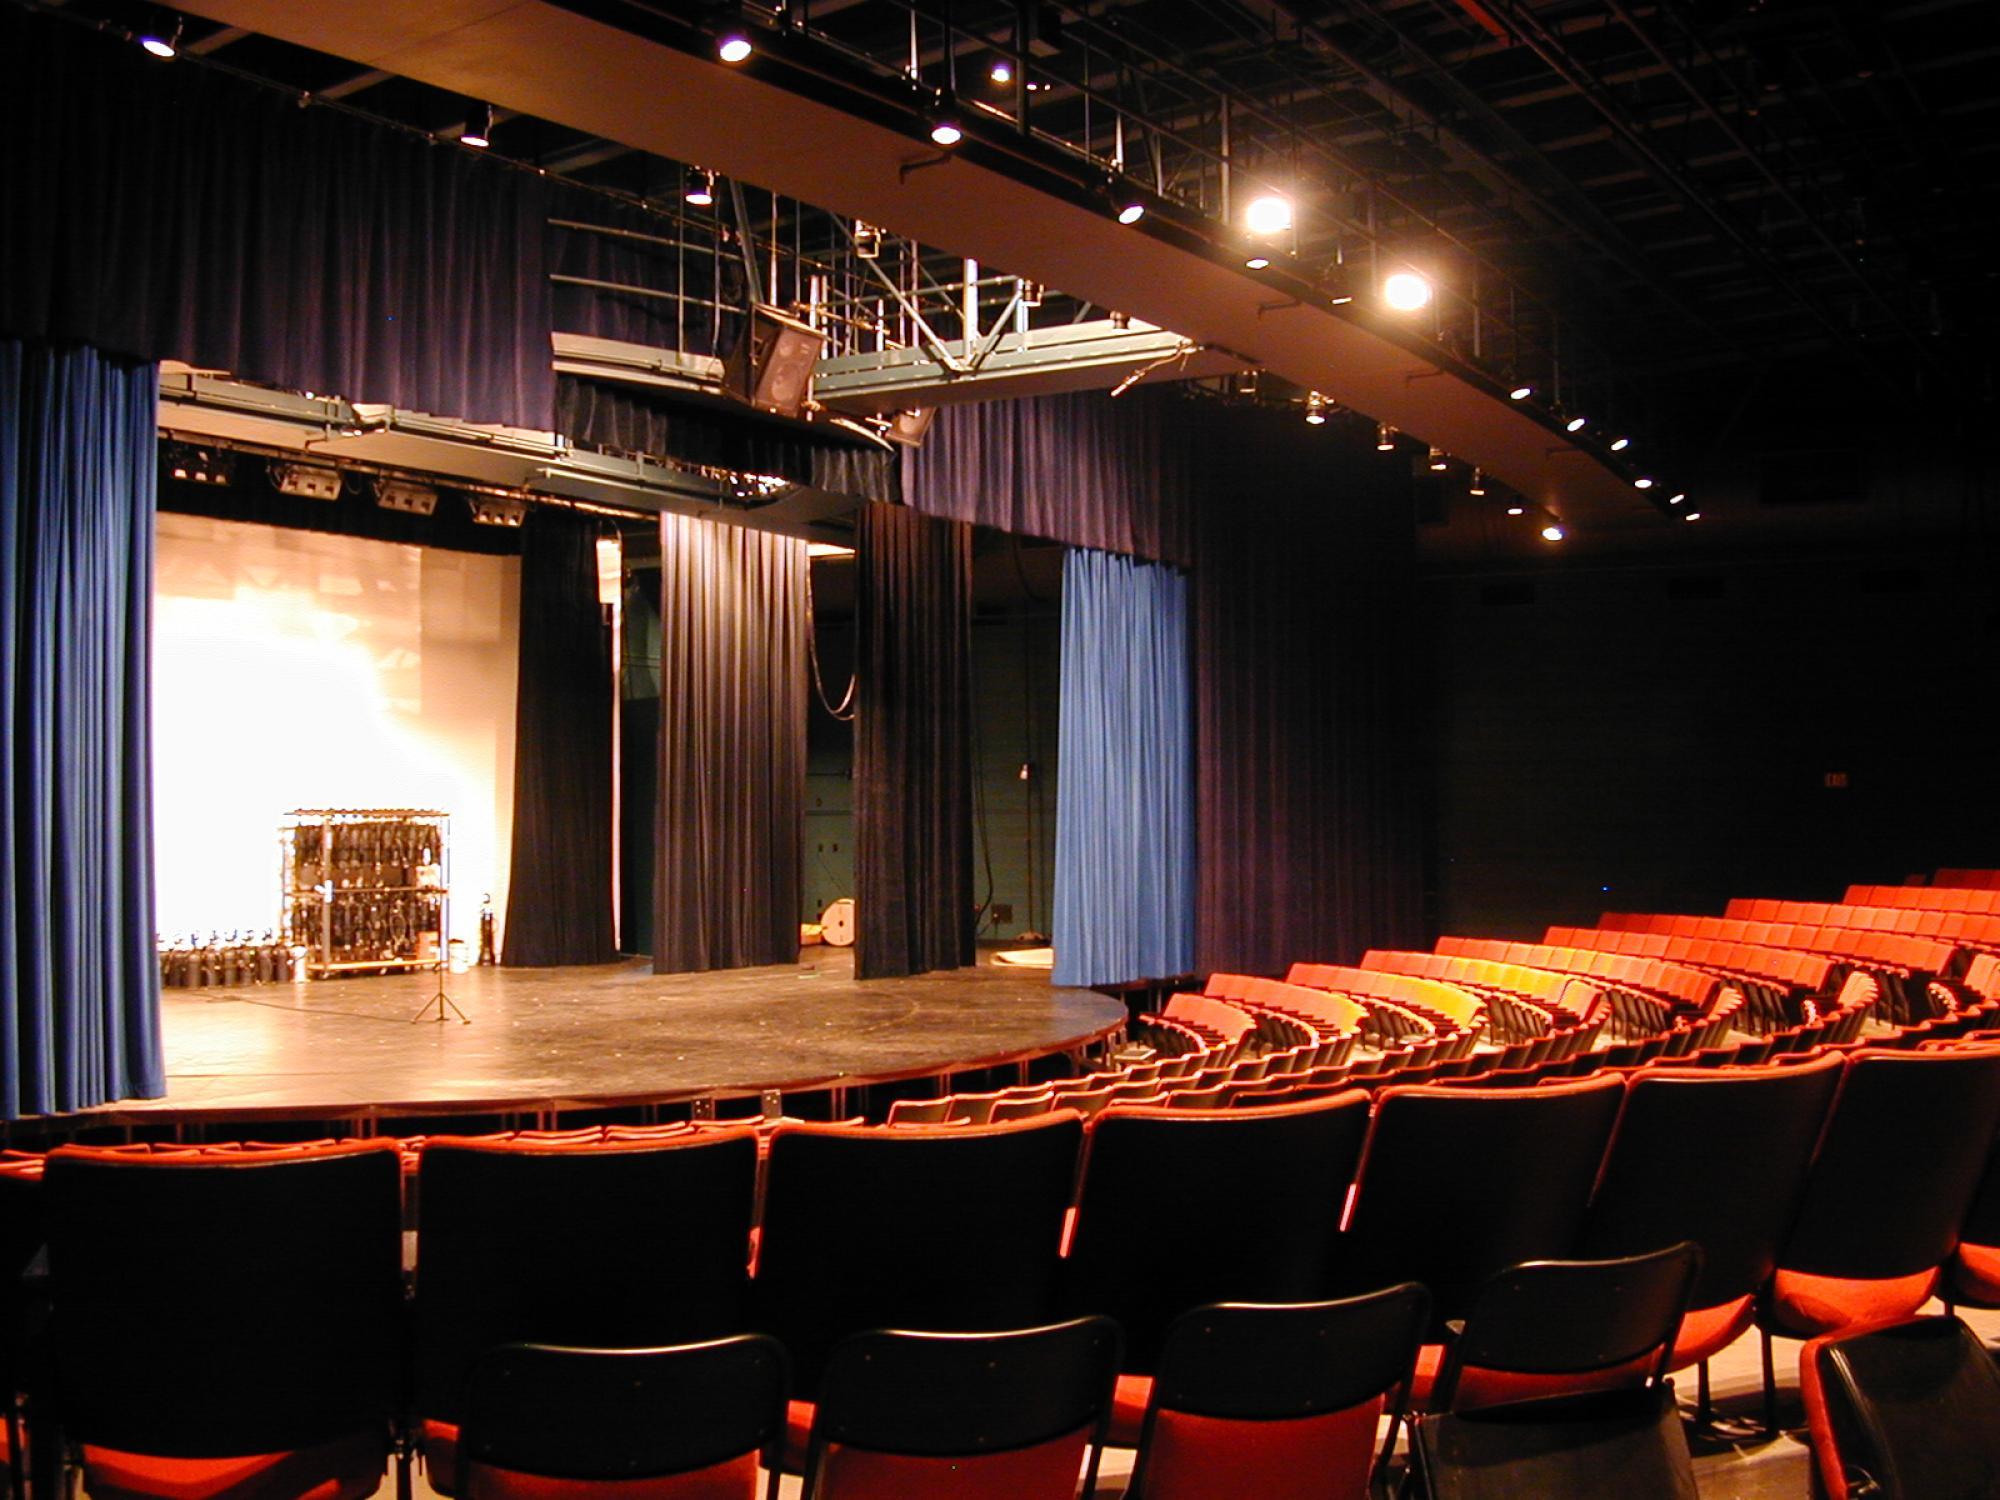 Roberts Theatre